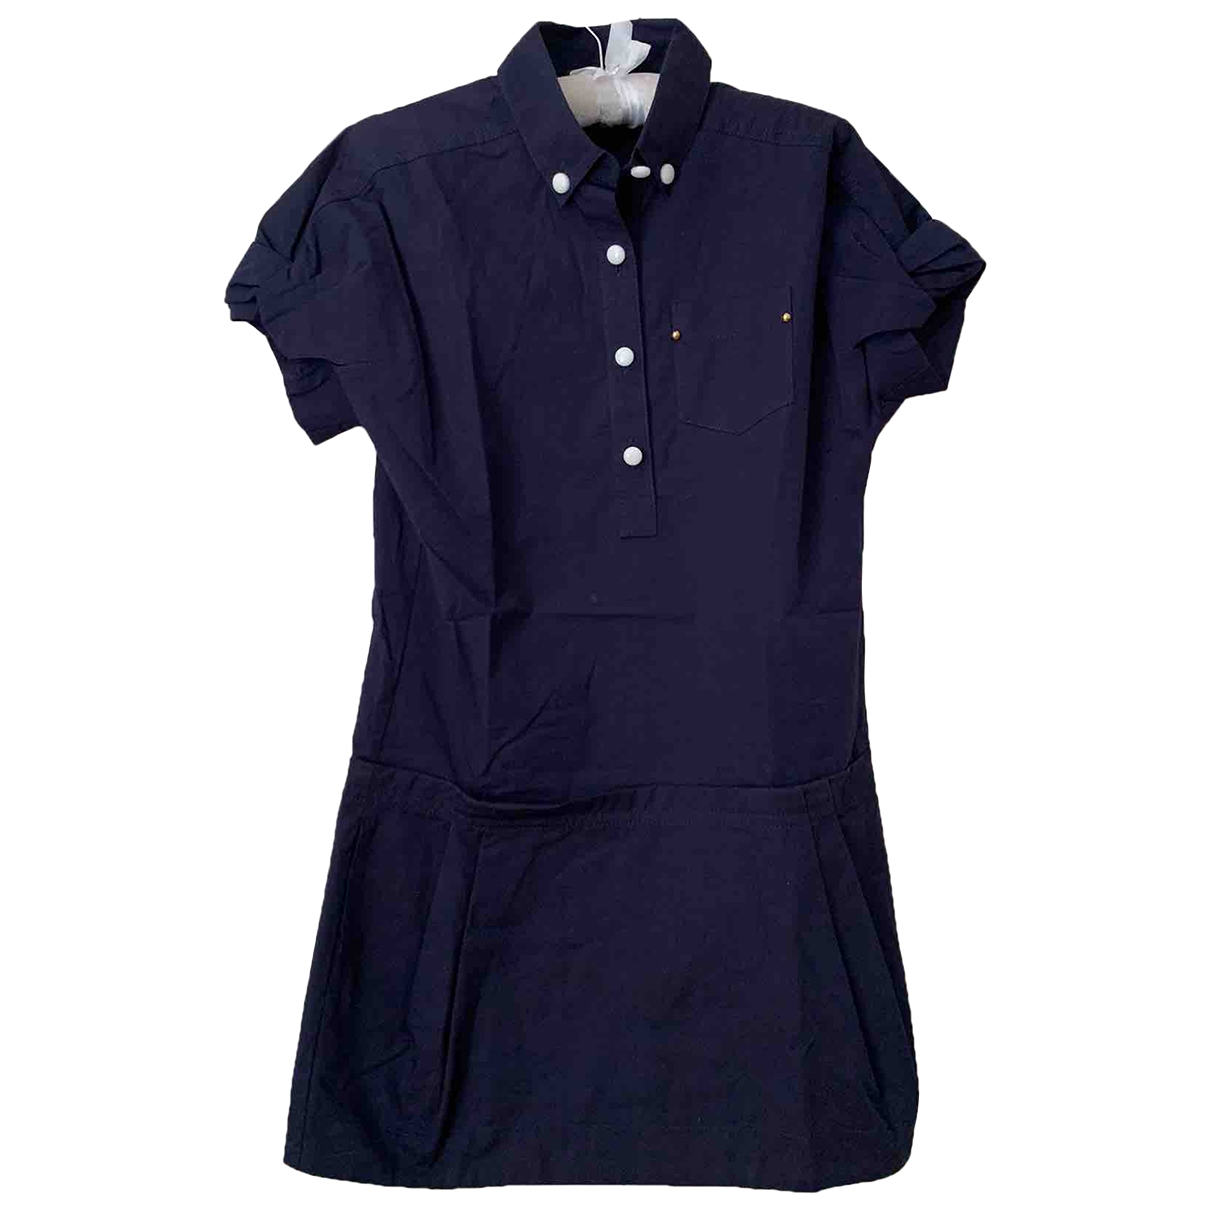 Louis Vuitton \N Blue Cotton dress for Women 34 FR